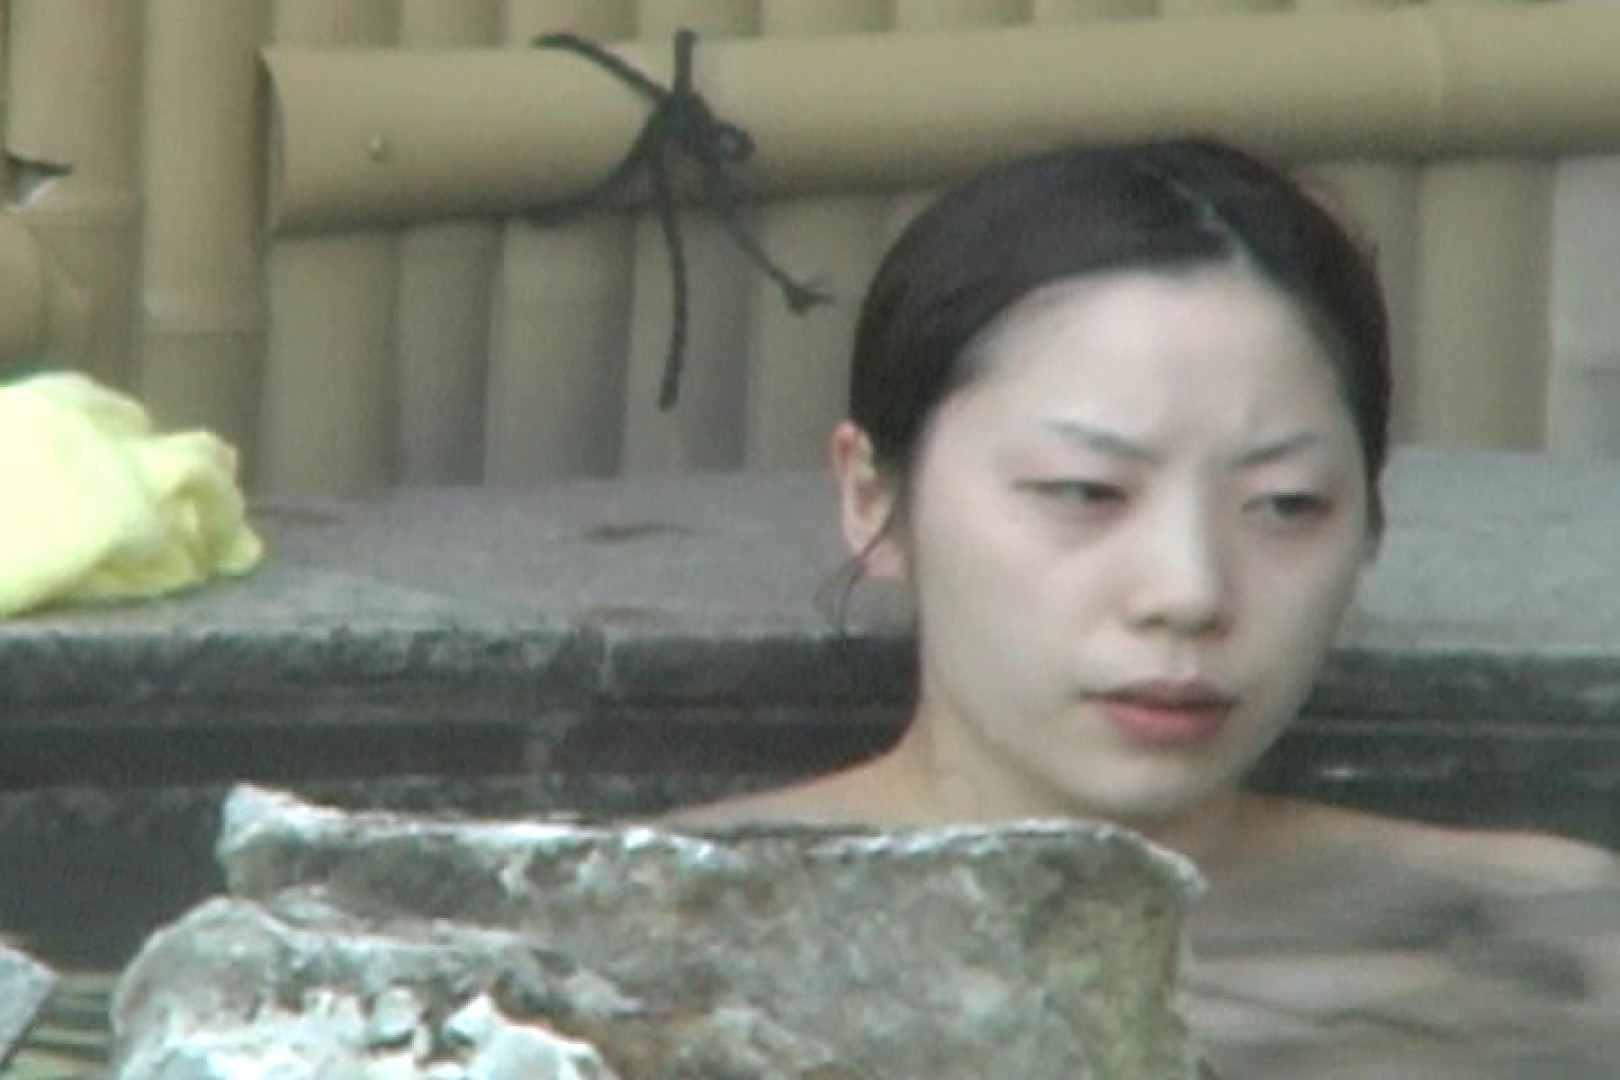 Aquaな露天風呂Vol.596 盗撮シリーズ | 露天風呂編  113PIX 39